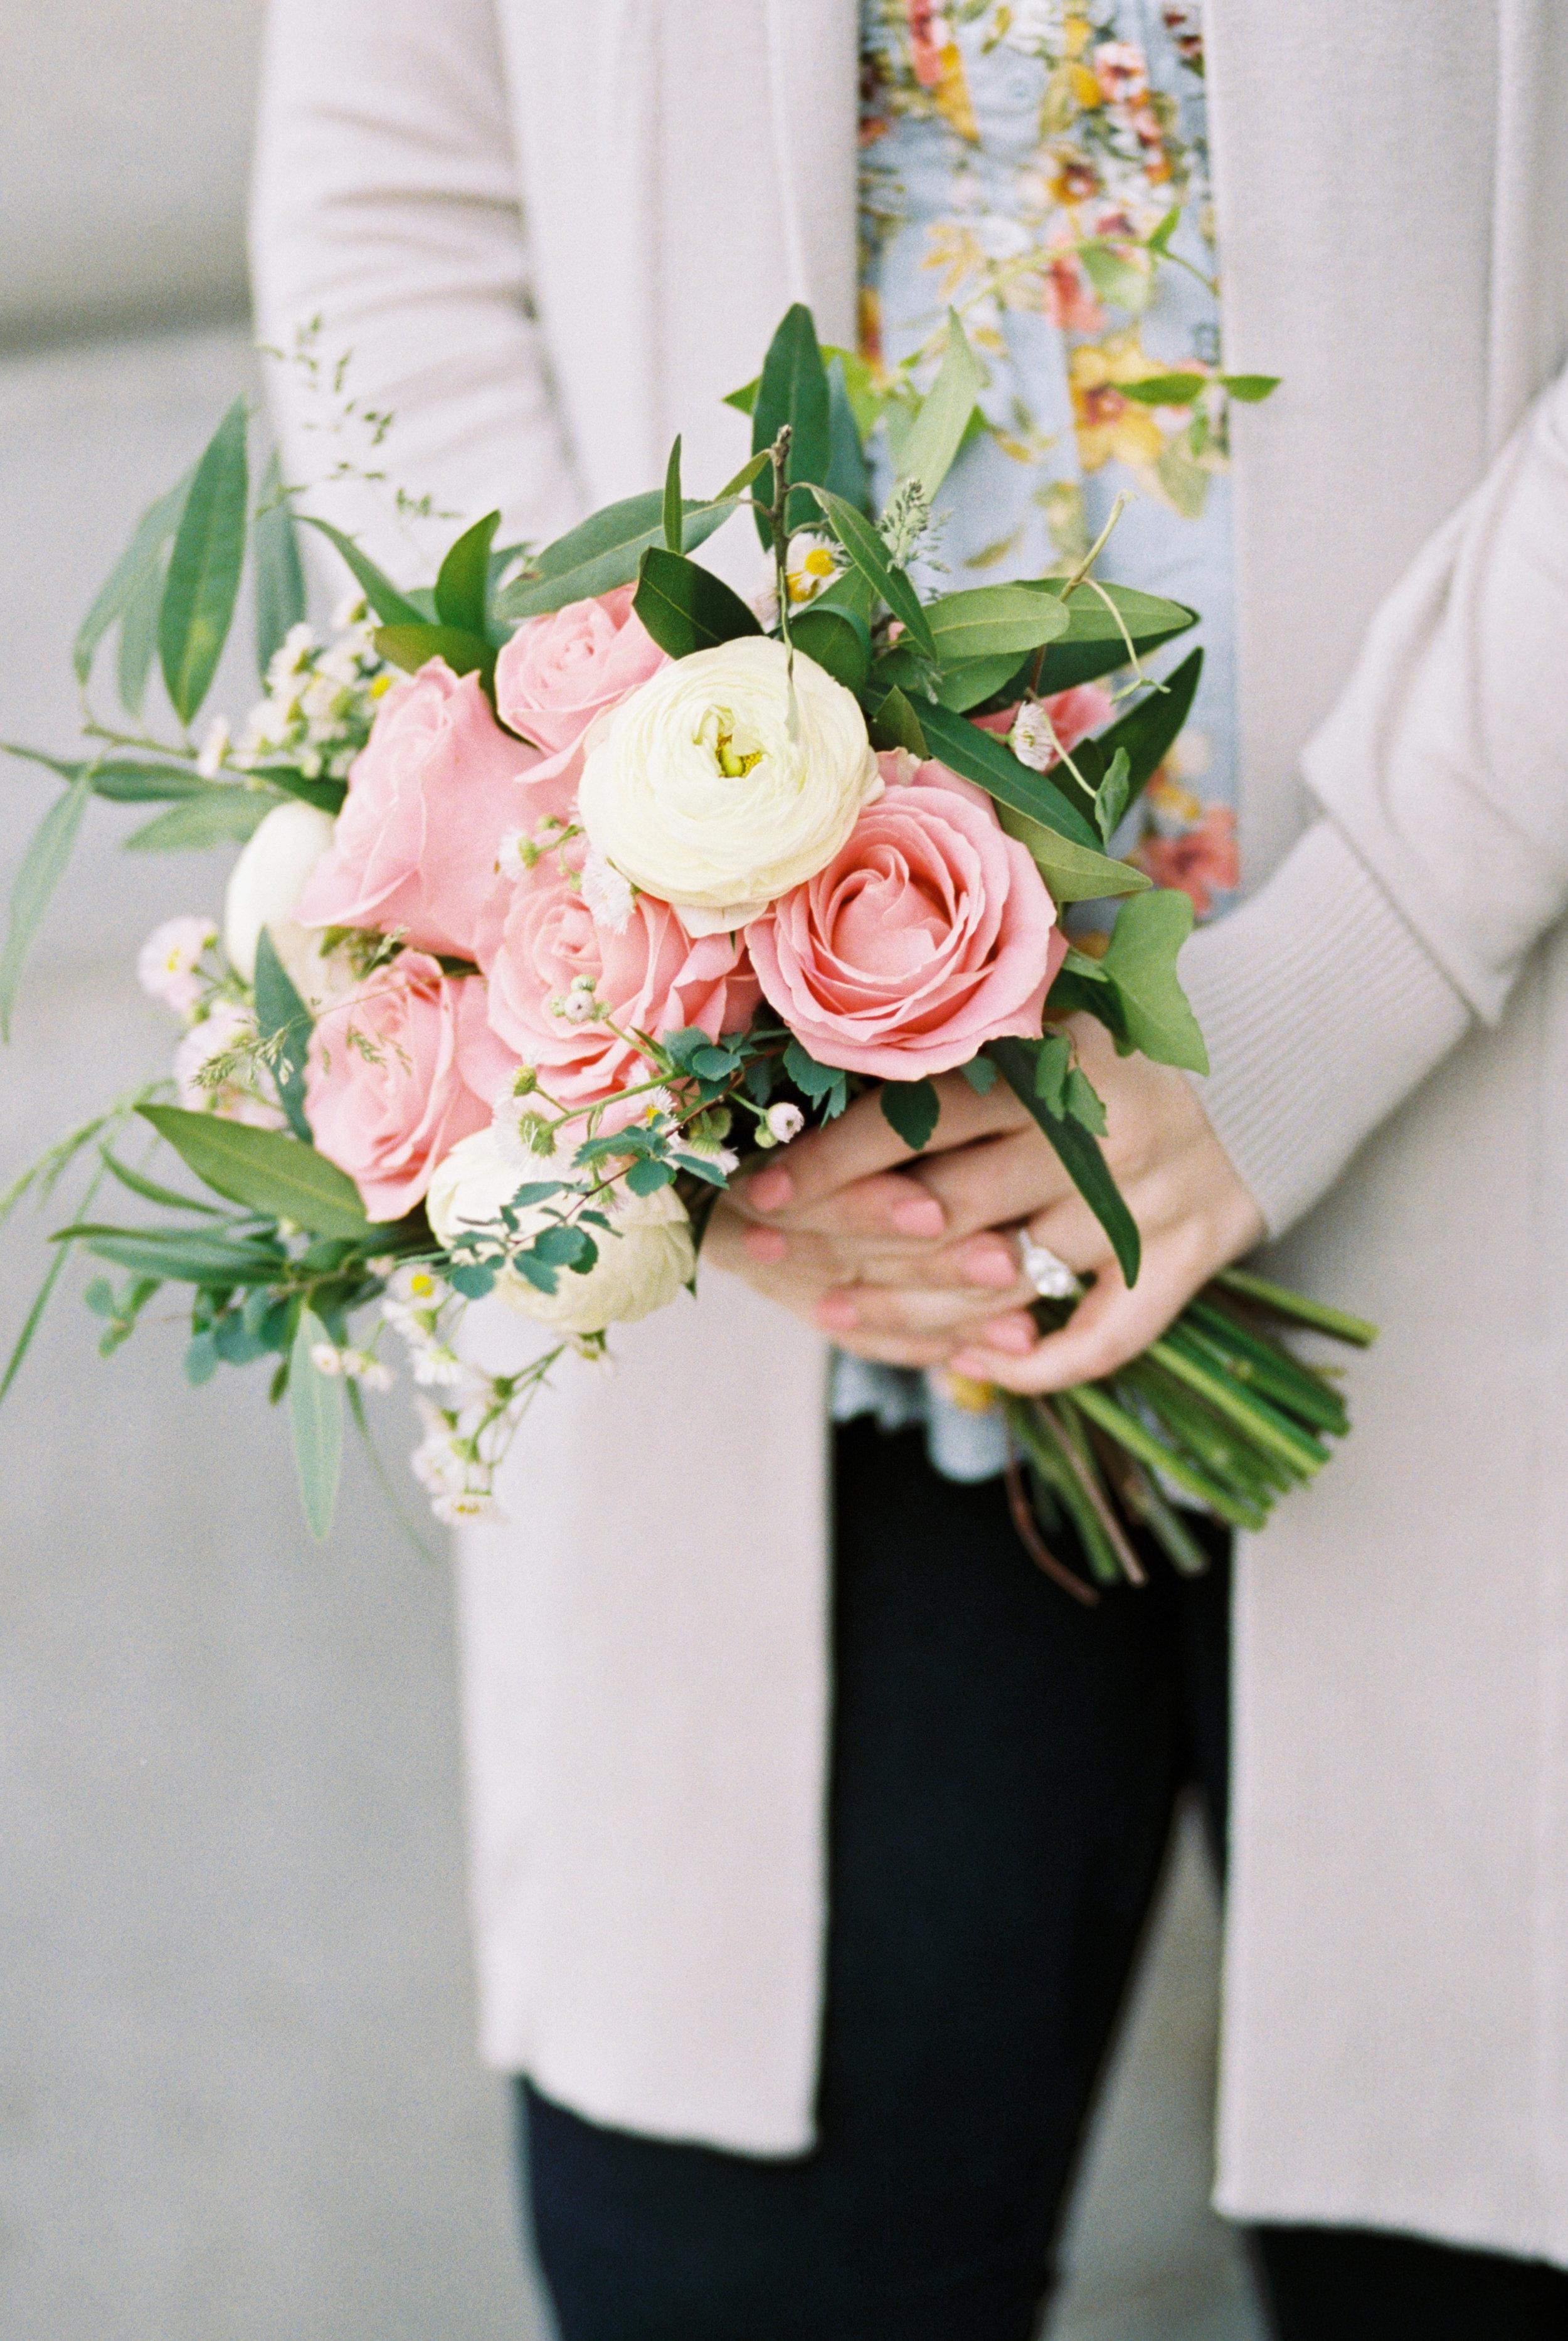 pink-and-white-bridesmaids-bouquet-amy-lauren-floral-design